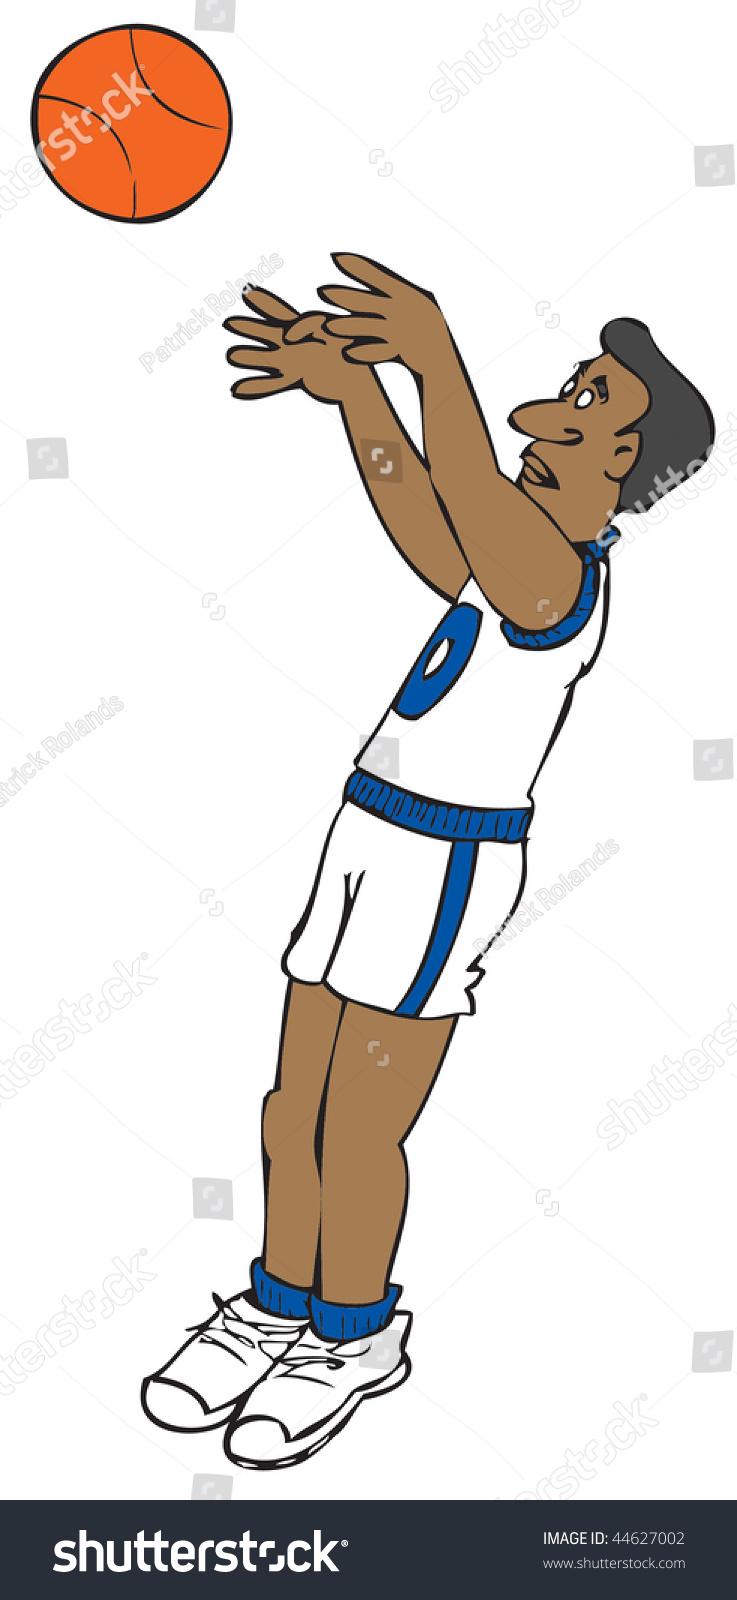 cartoon basketball player stock vector 44627002 shutterstock Baseball Pitcher Clip Art Black and White Baseball Player Clip Art